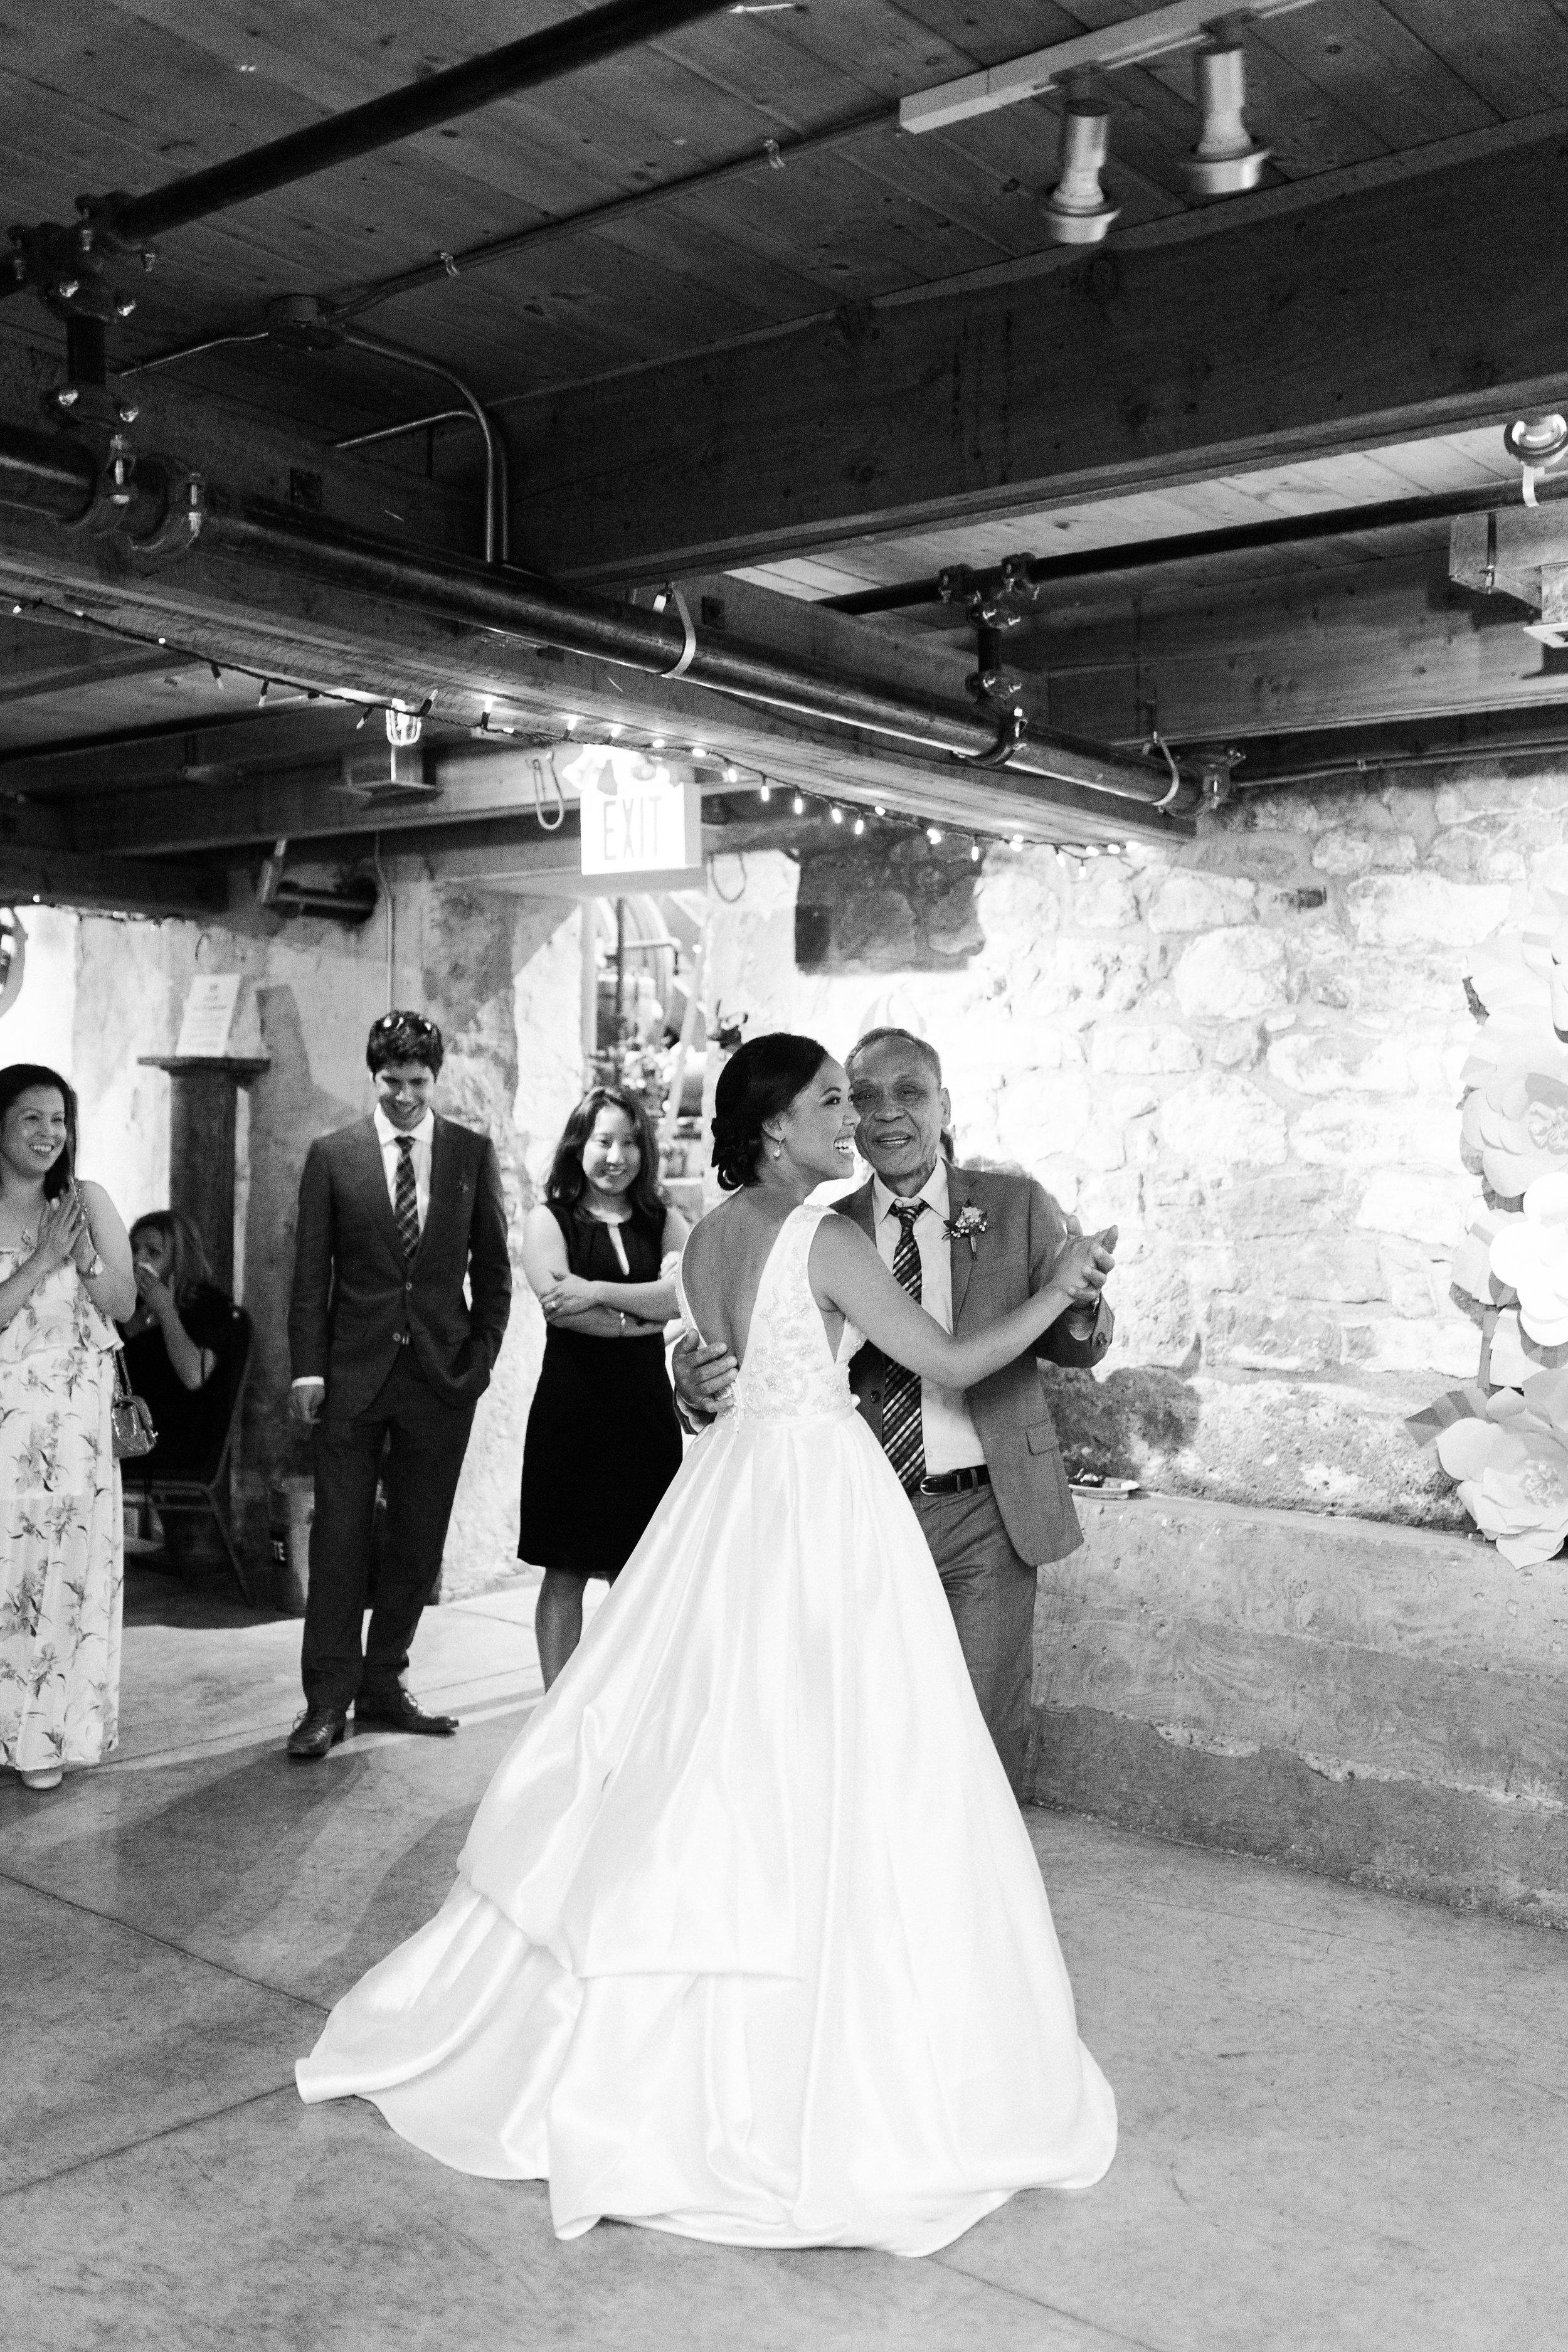 Alton Mills Wedding - Reception-175.jpg